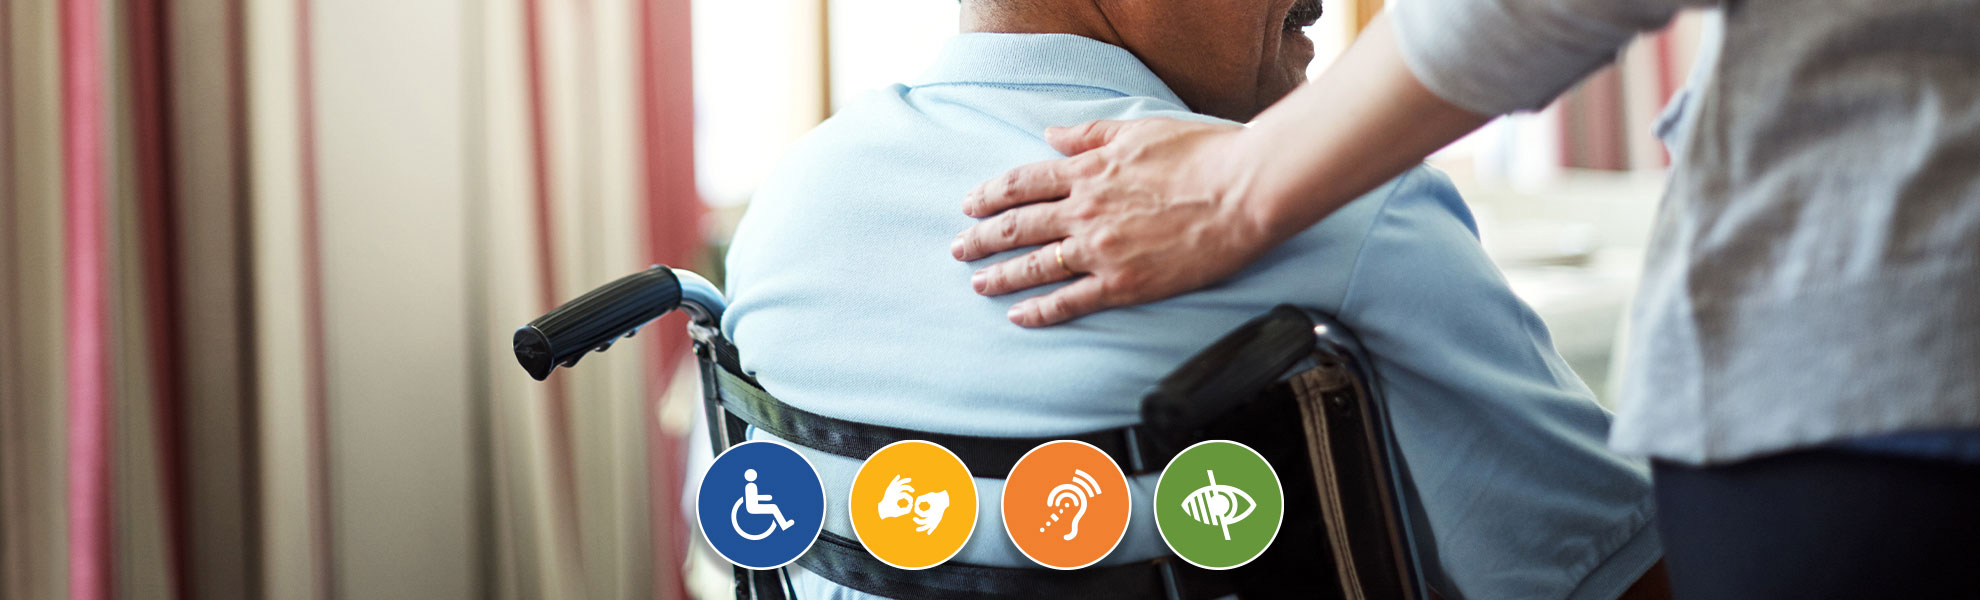 Providing Accessibility